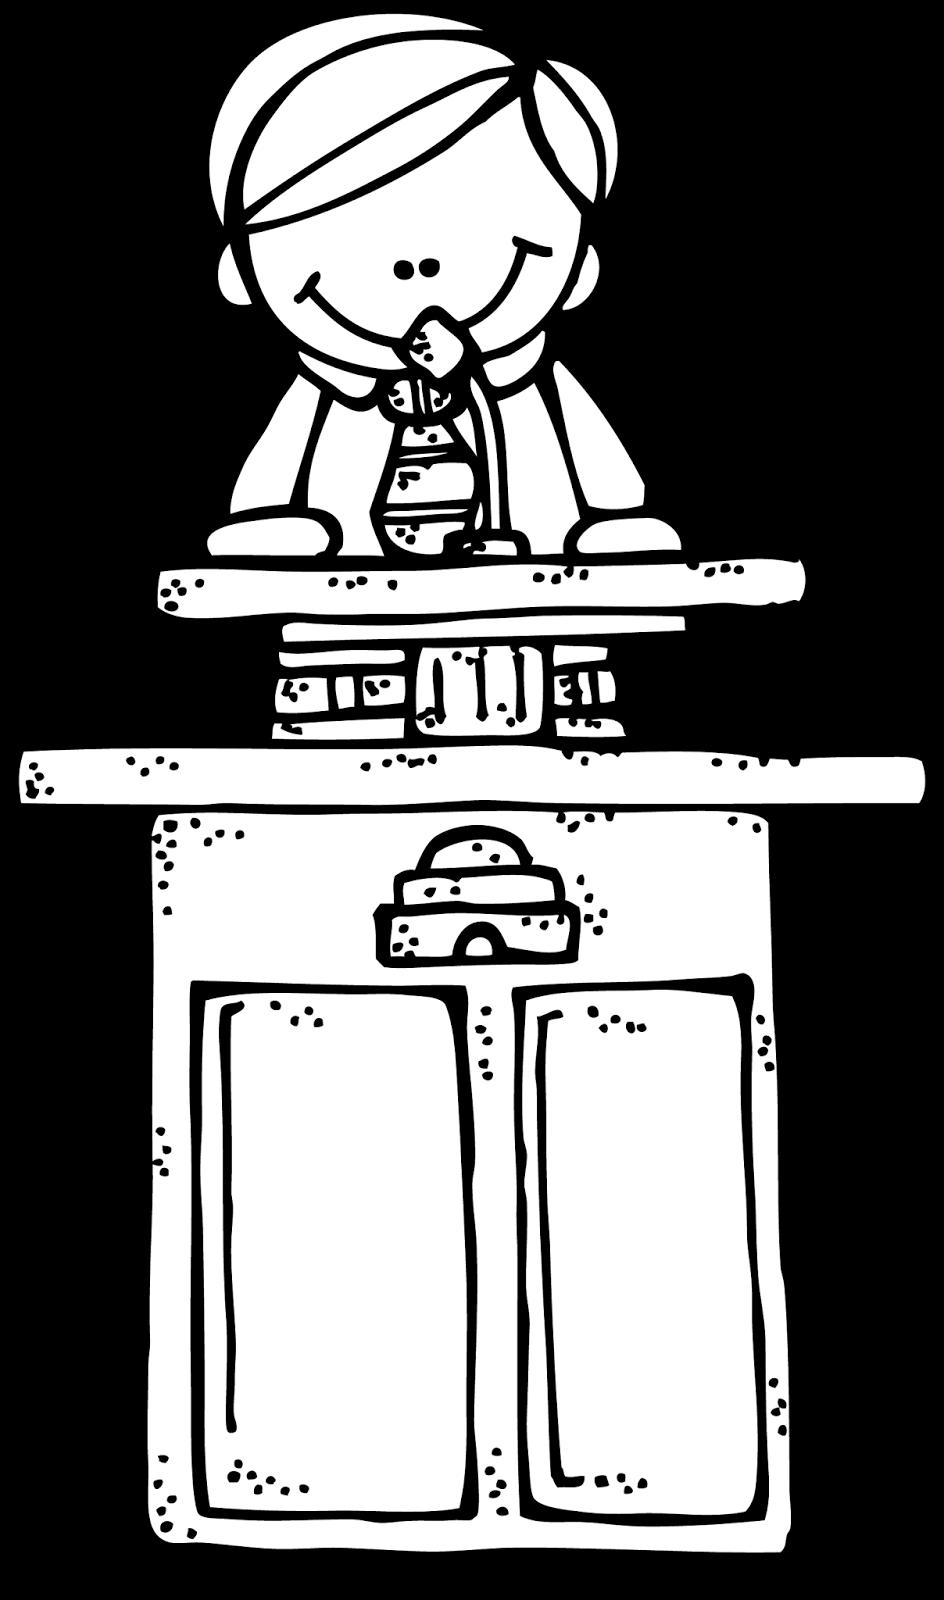 Lds clipart sacrament, Lds sacrament Transparent FREE for.